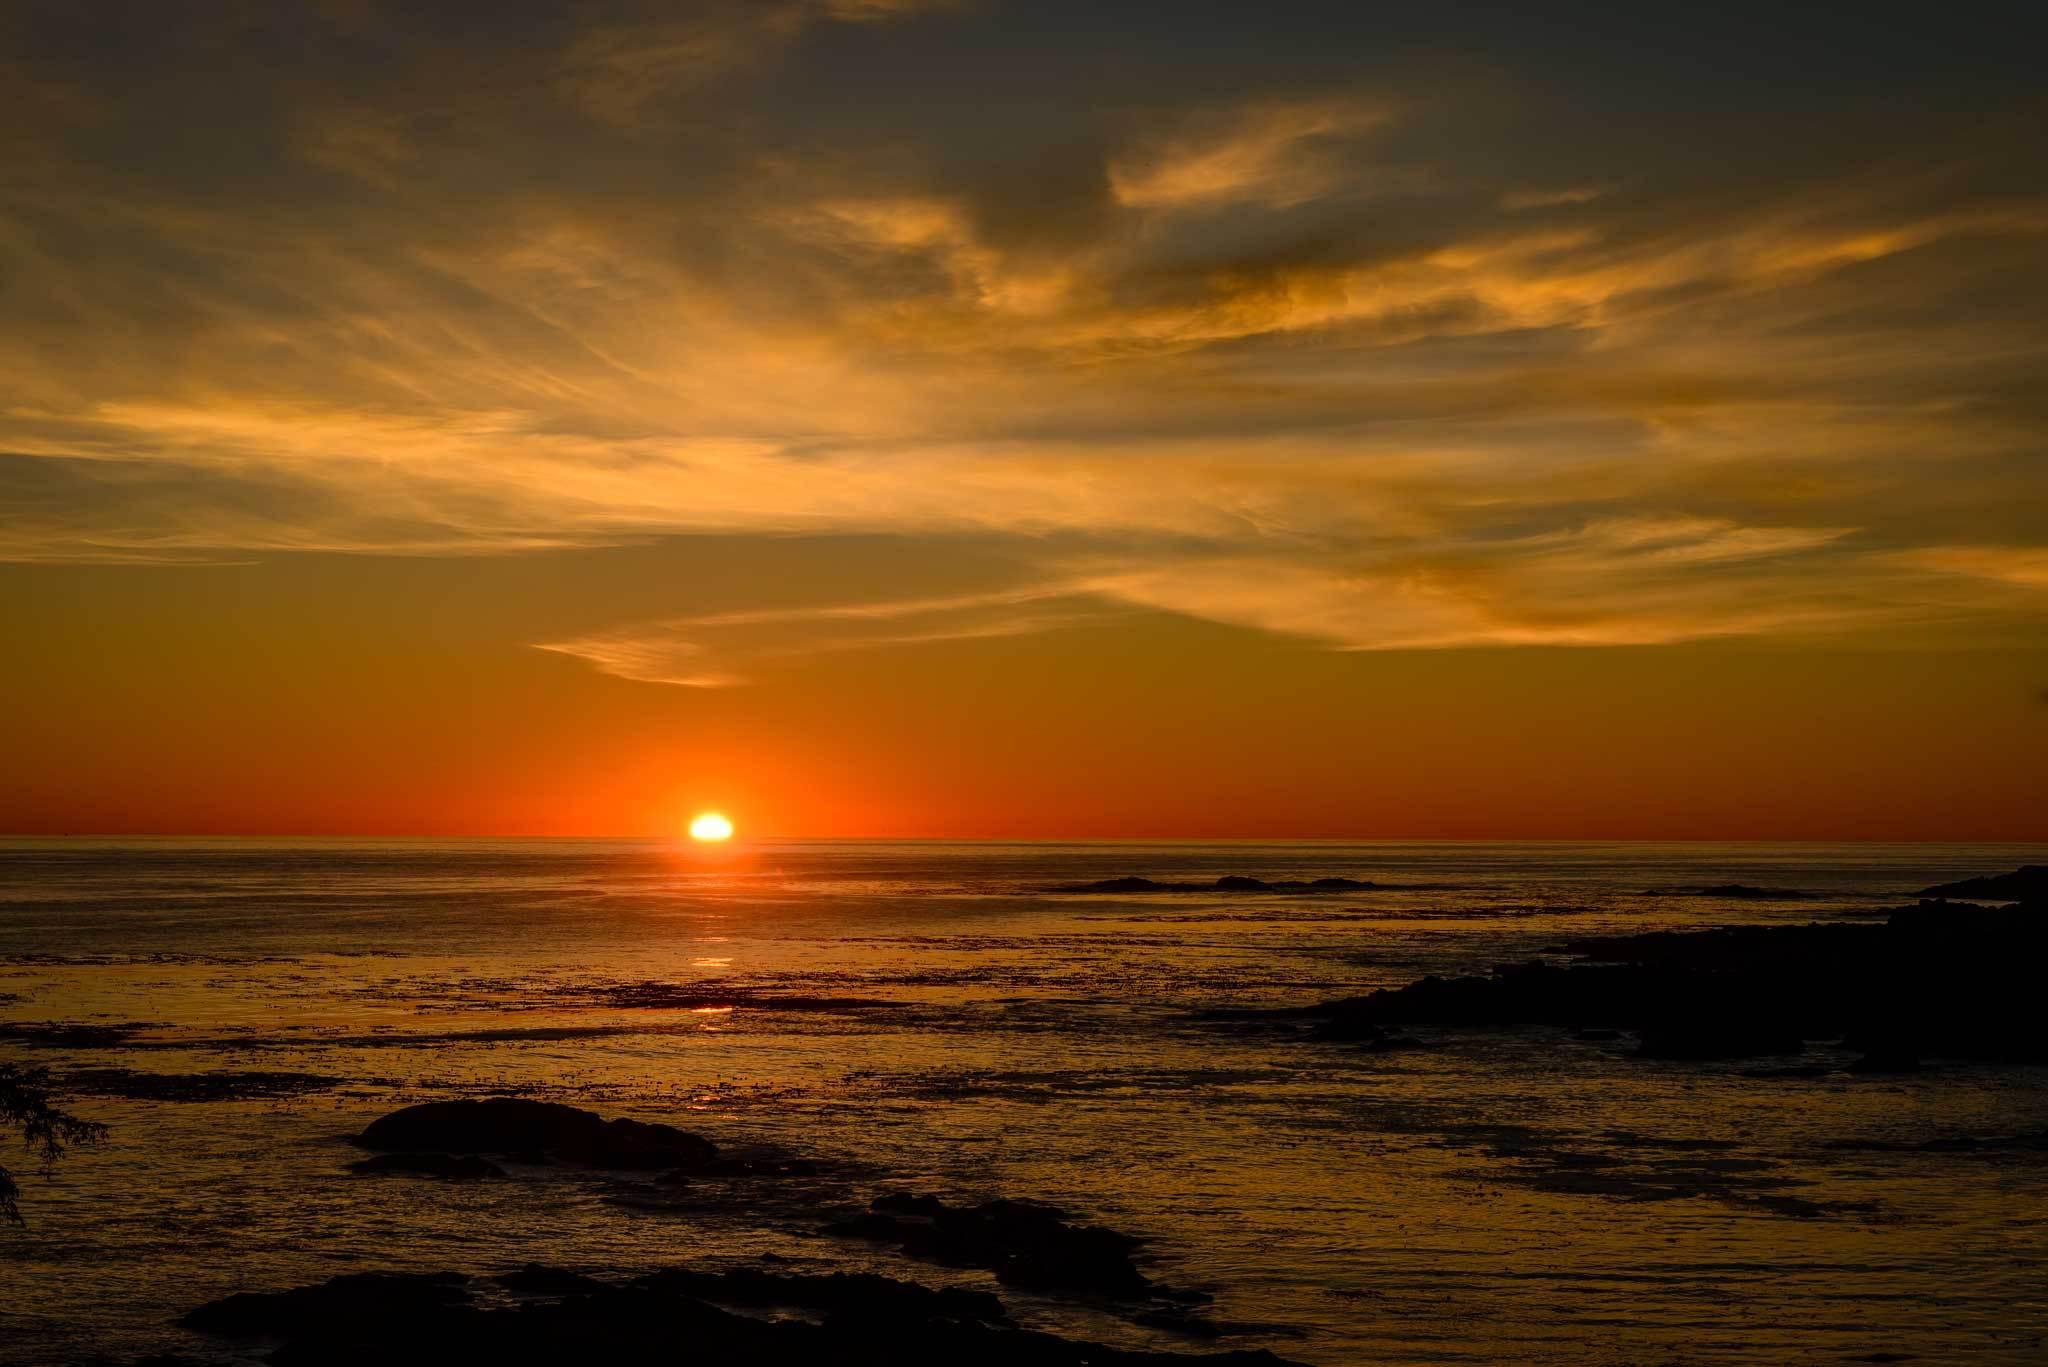 вечерний пейзаж на море картинки шарах этом